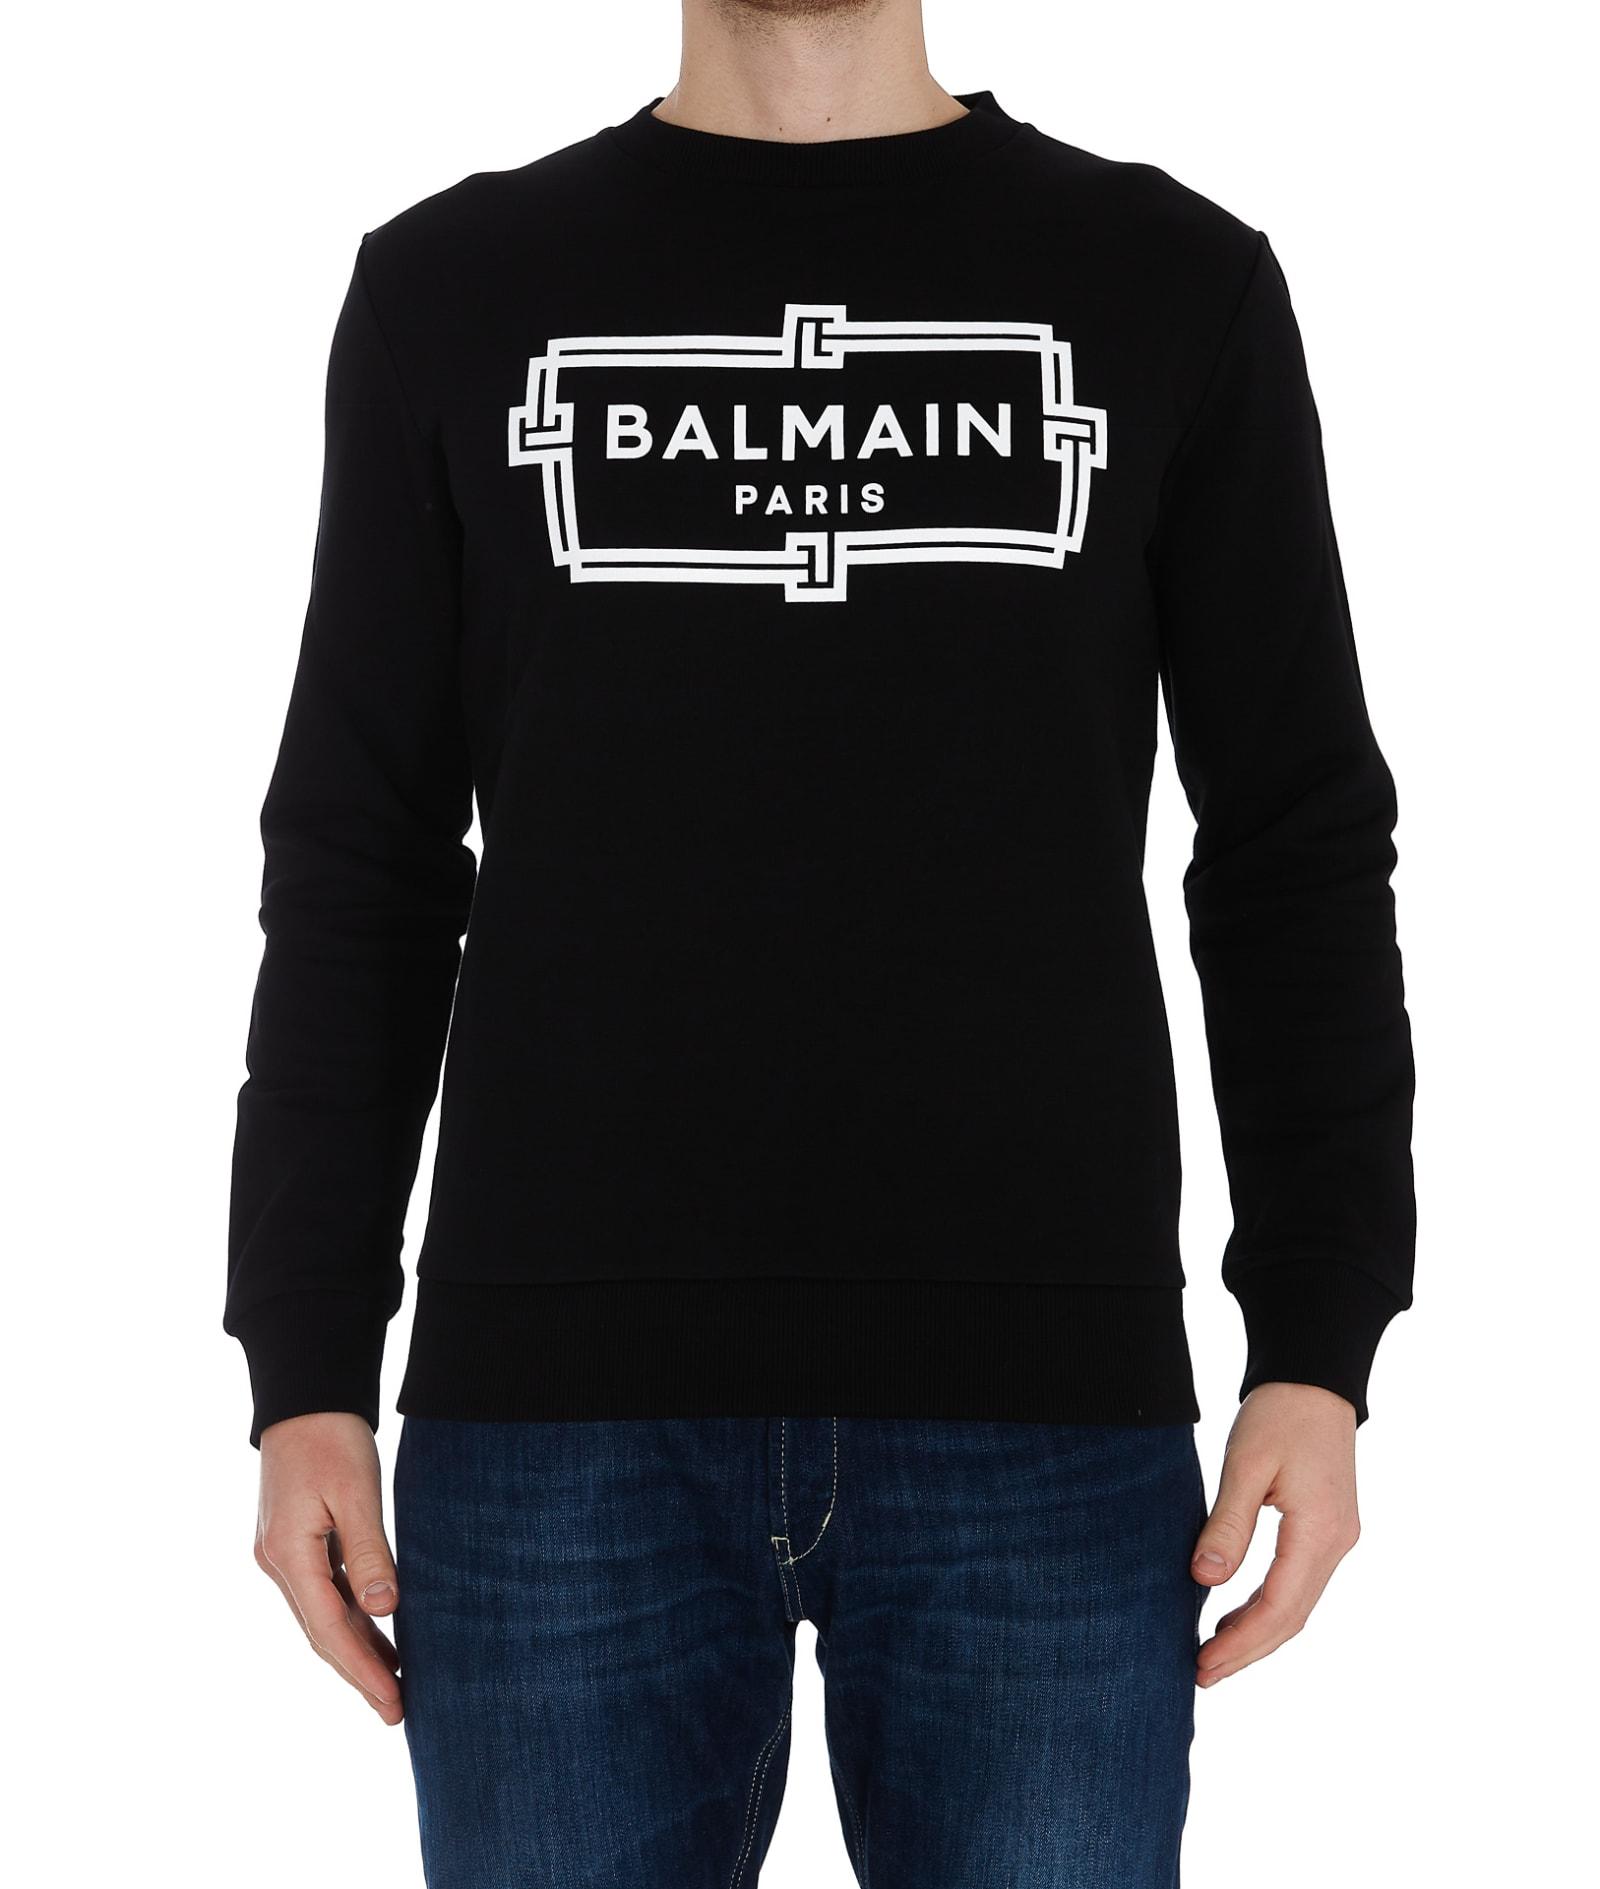 Balmain Sweatshirts LOGO SWEATSHIRT